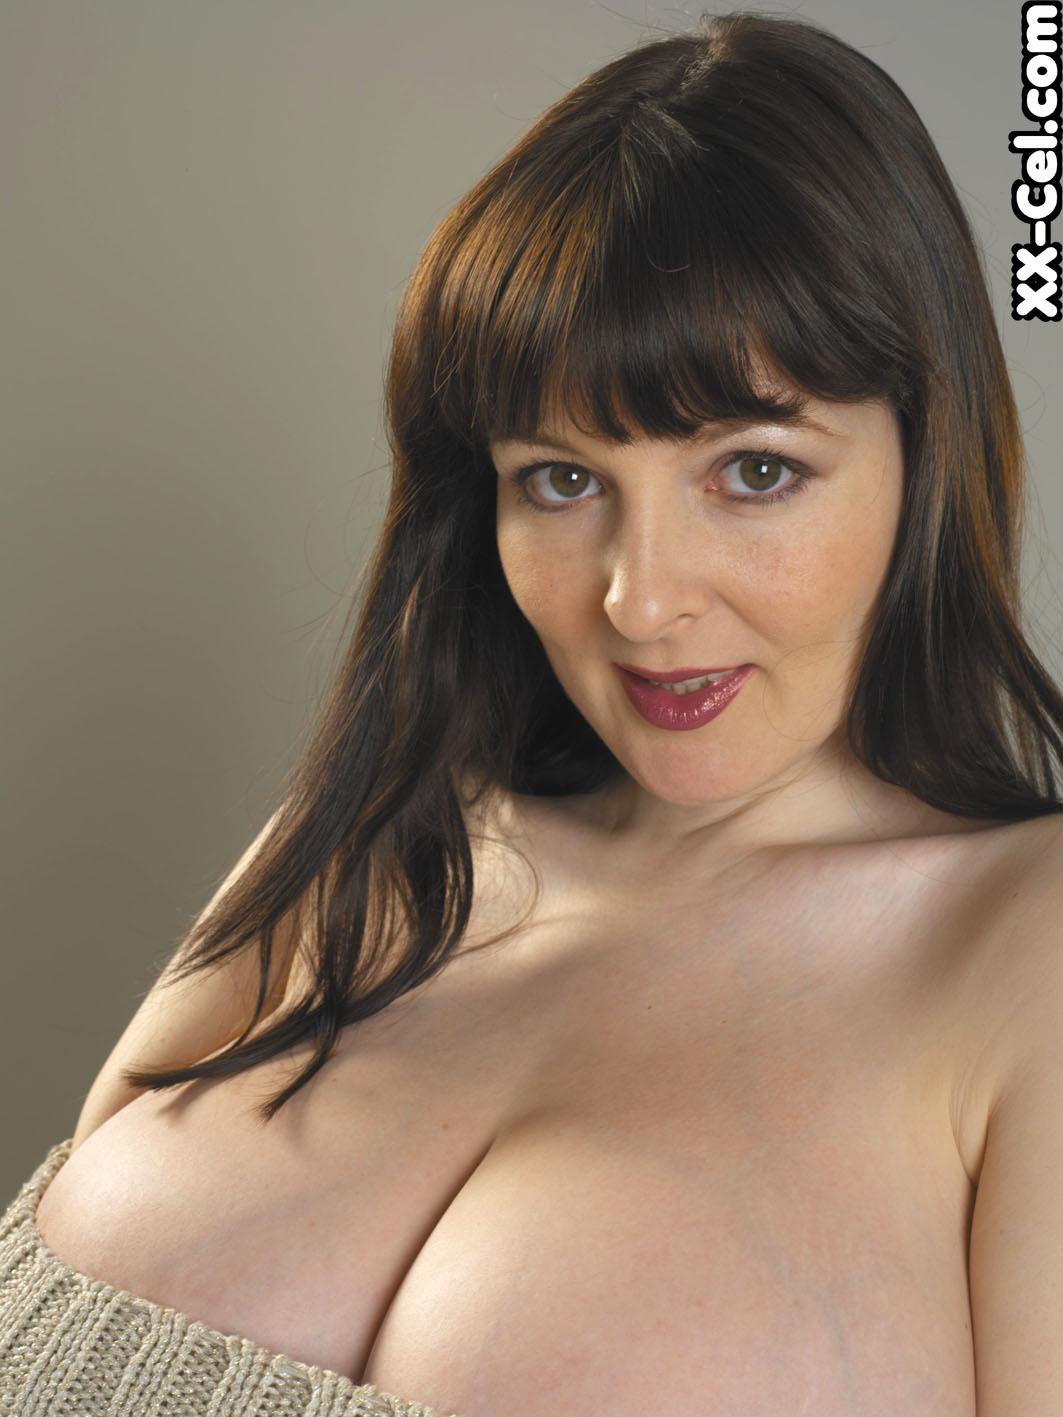 meera jasmine nude picture